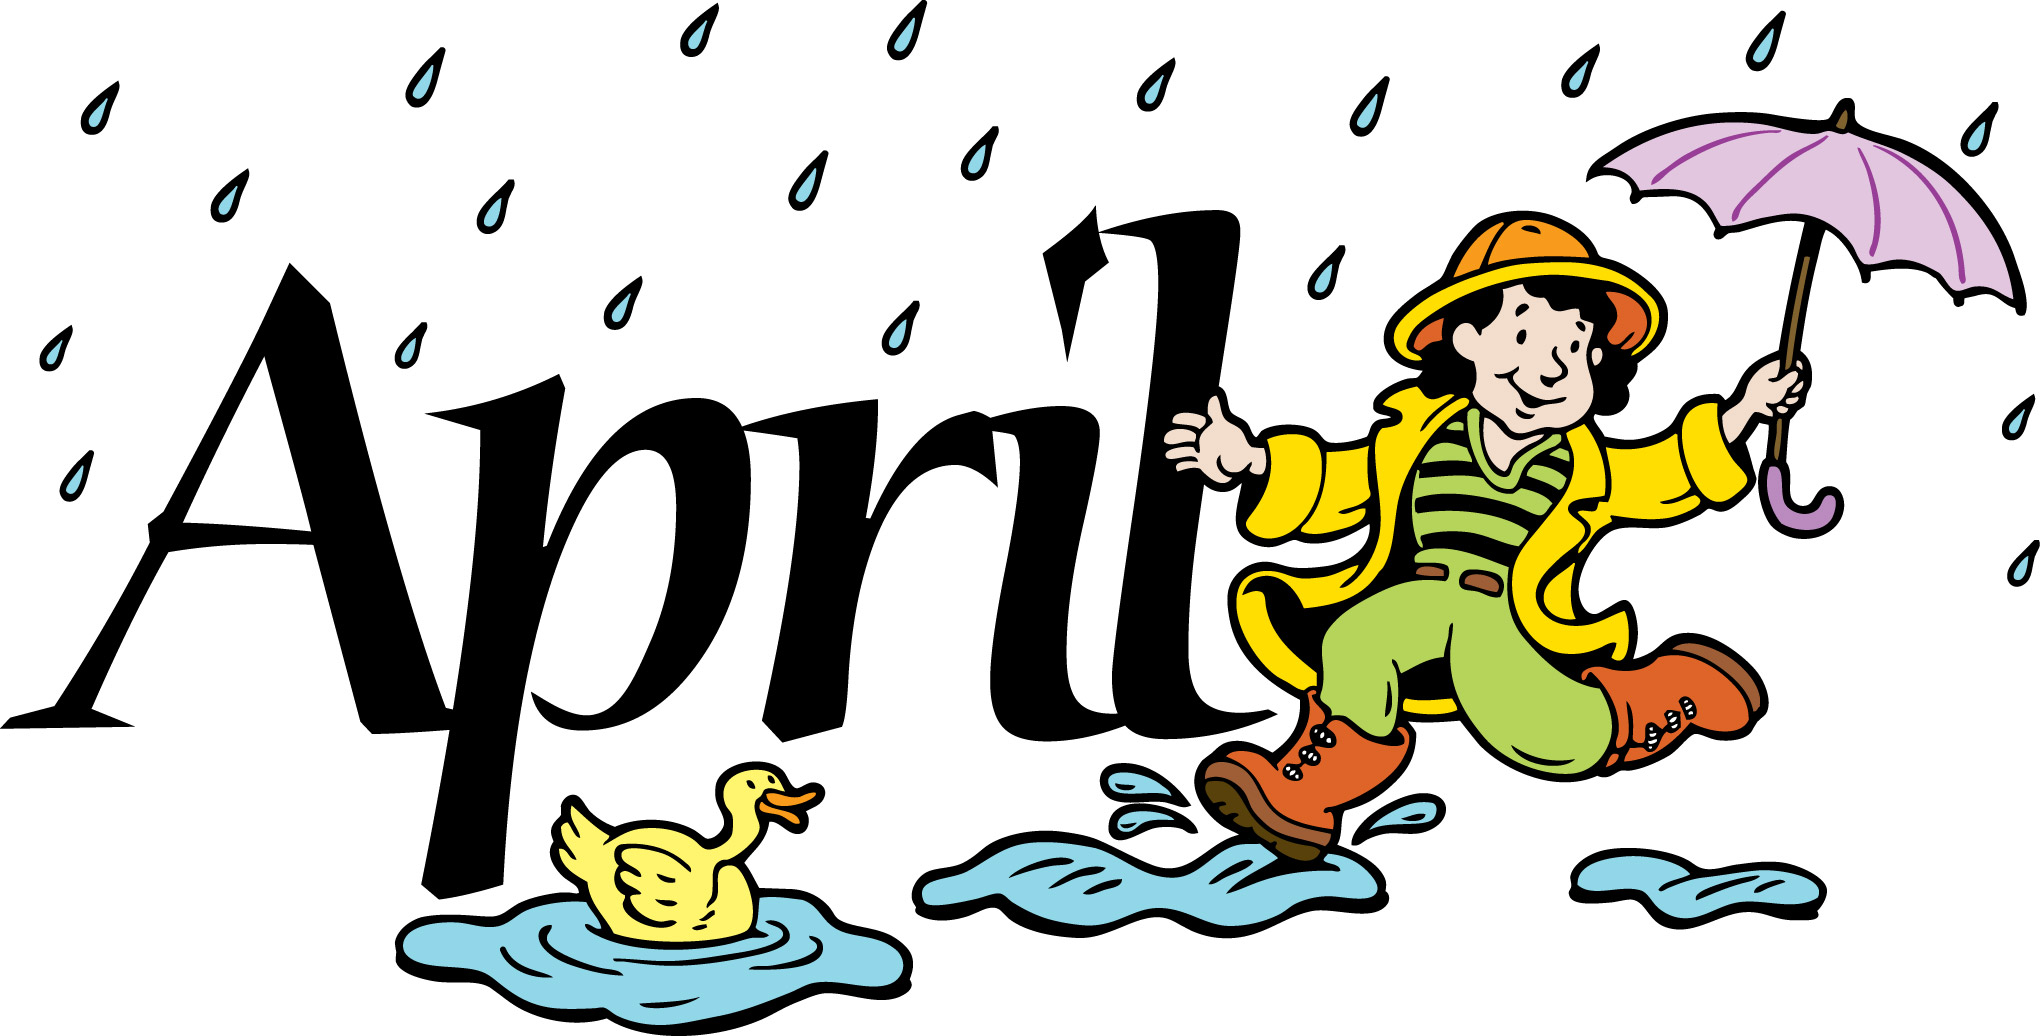 http://www.hwdsb.on.ca/sirwilliamosler/files/2014/04/april.jpg